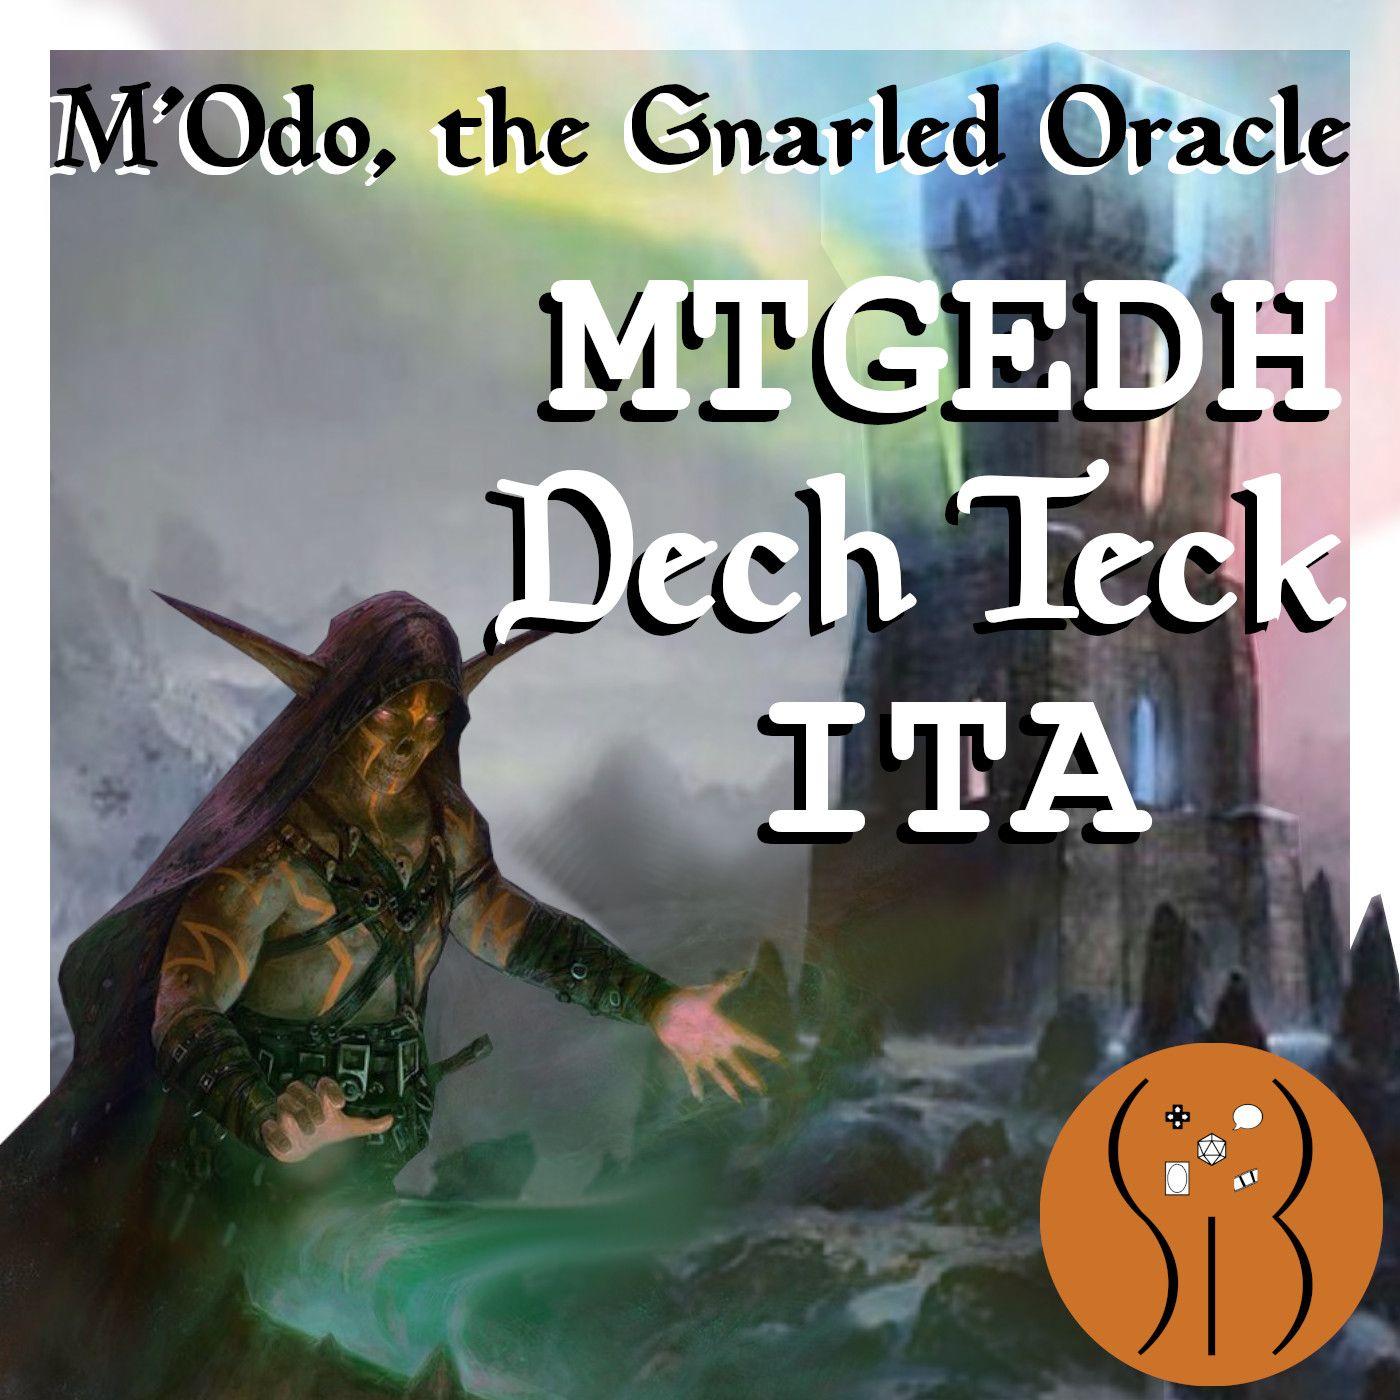 M'Odo the Gnarled Oracle MTGEDH deck tech ITA